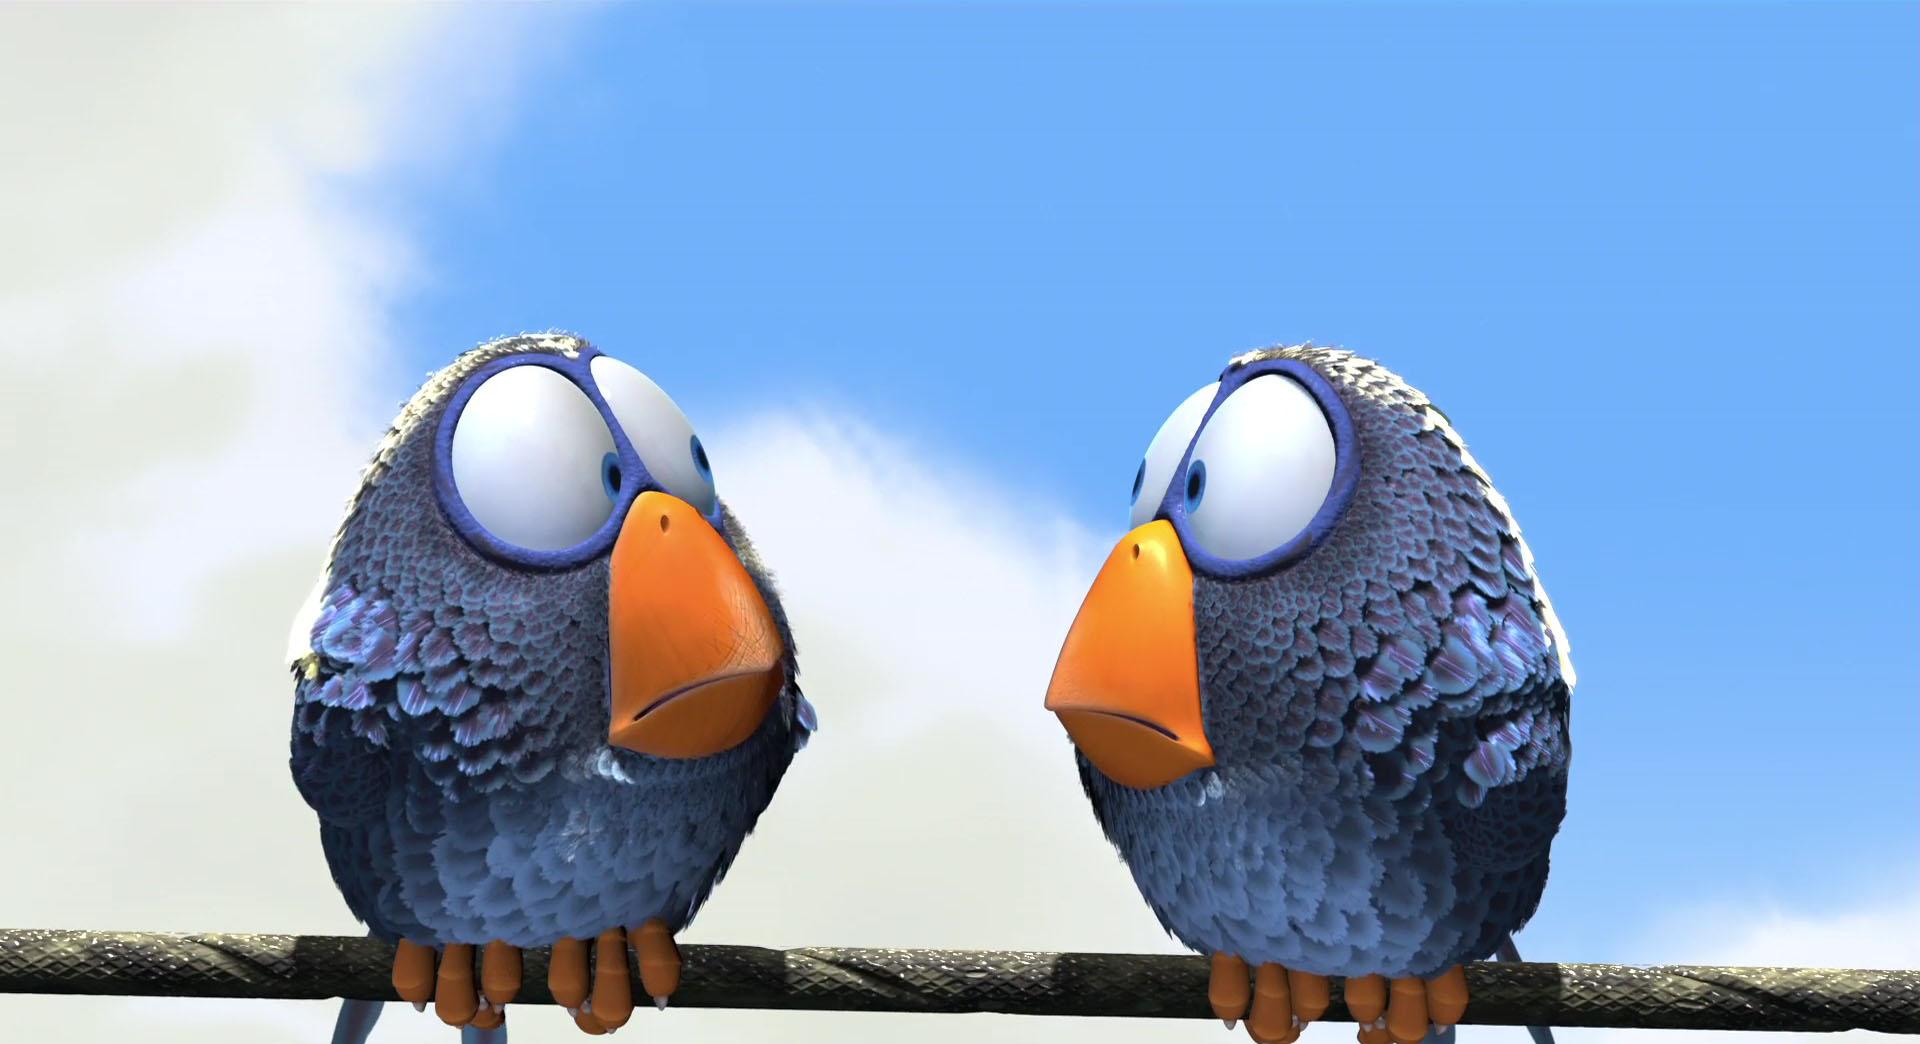 oiseau-personnage-drole-oiseau-ligne-haute-tension-01